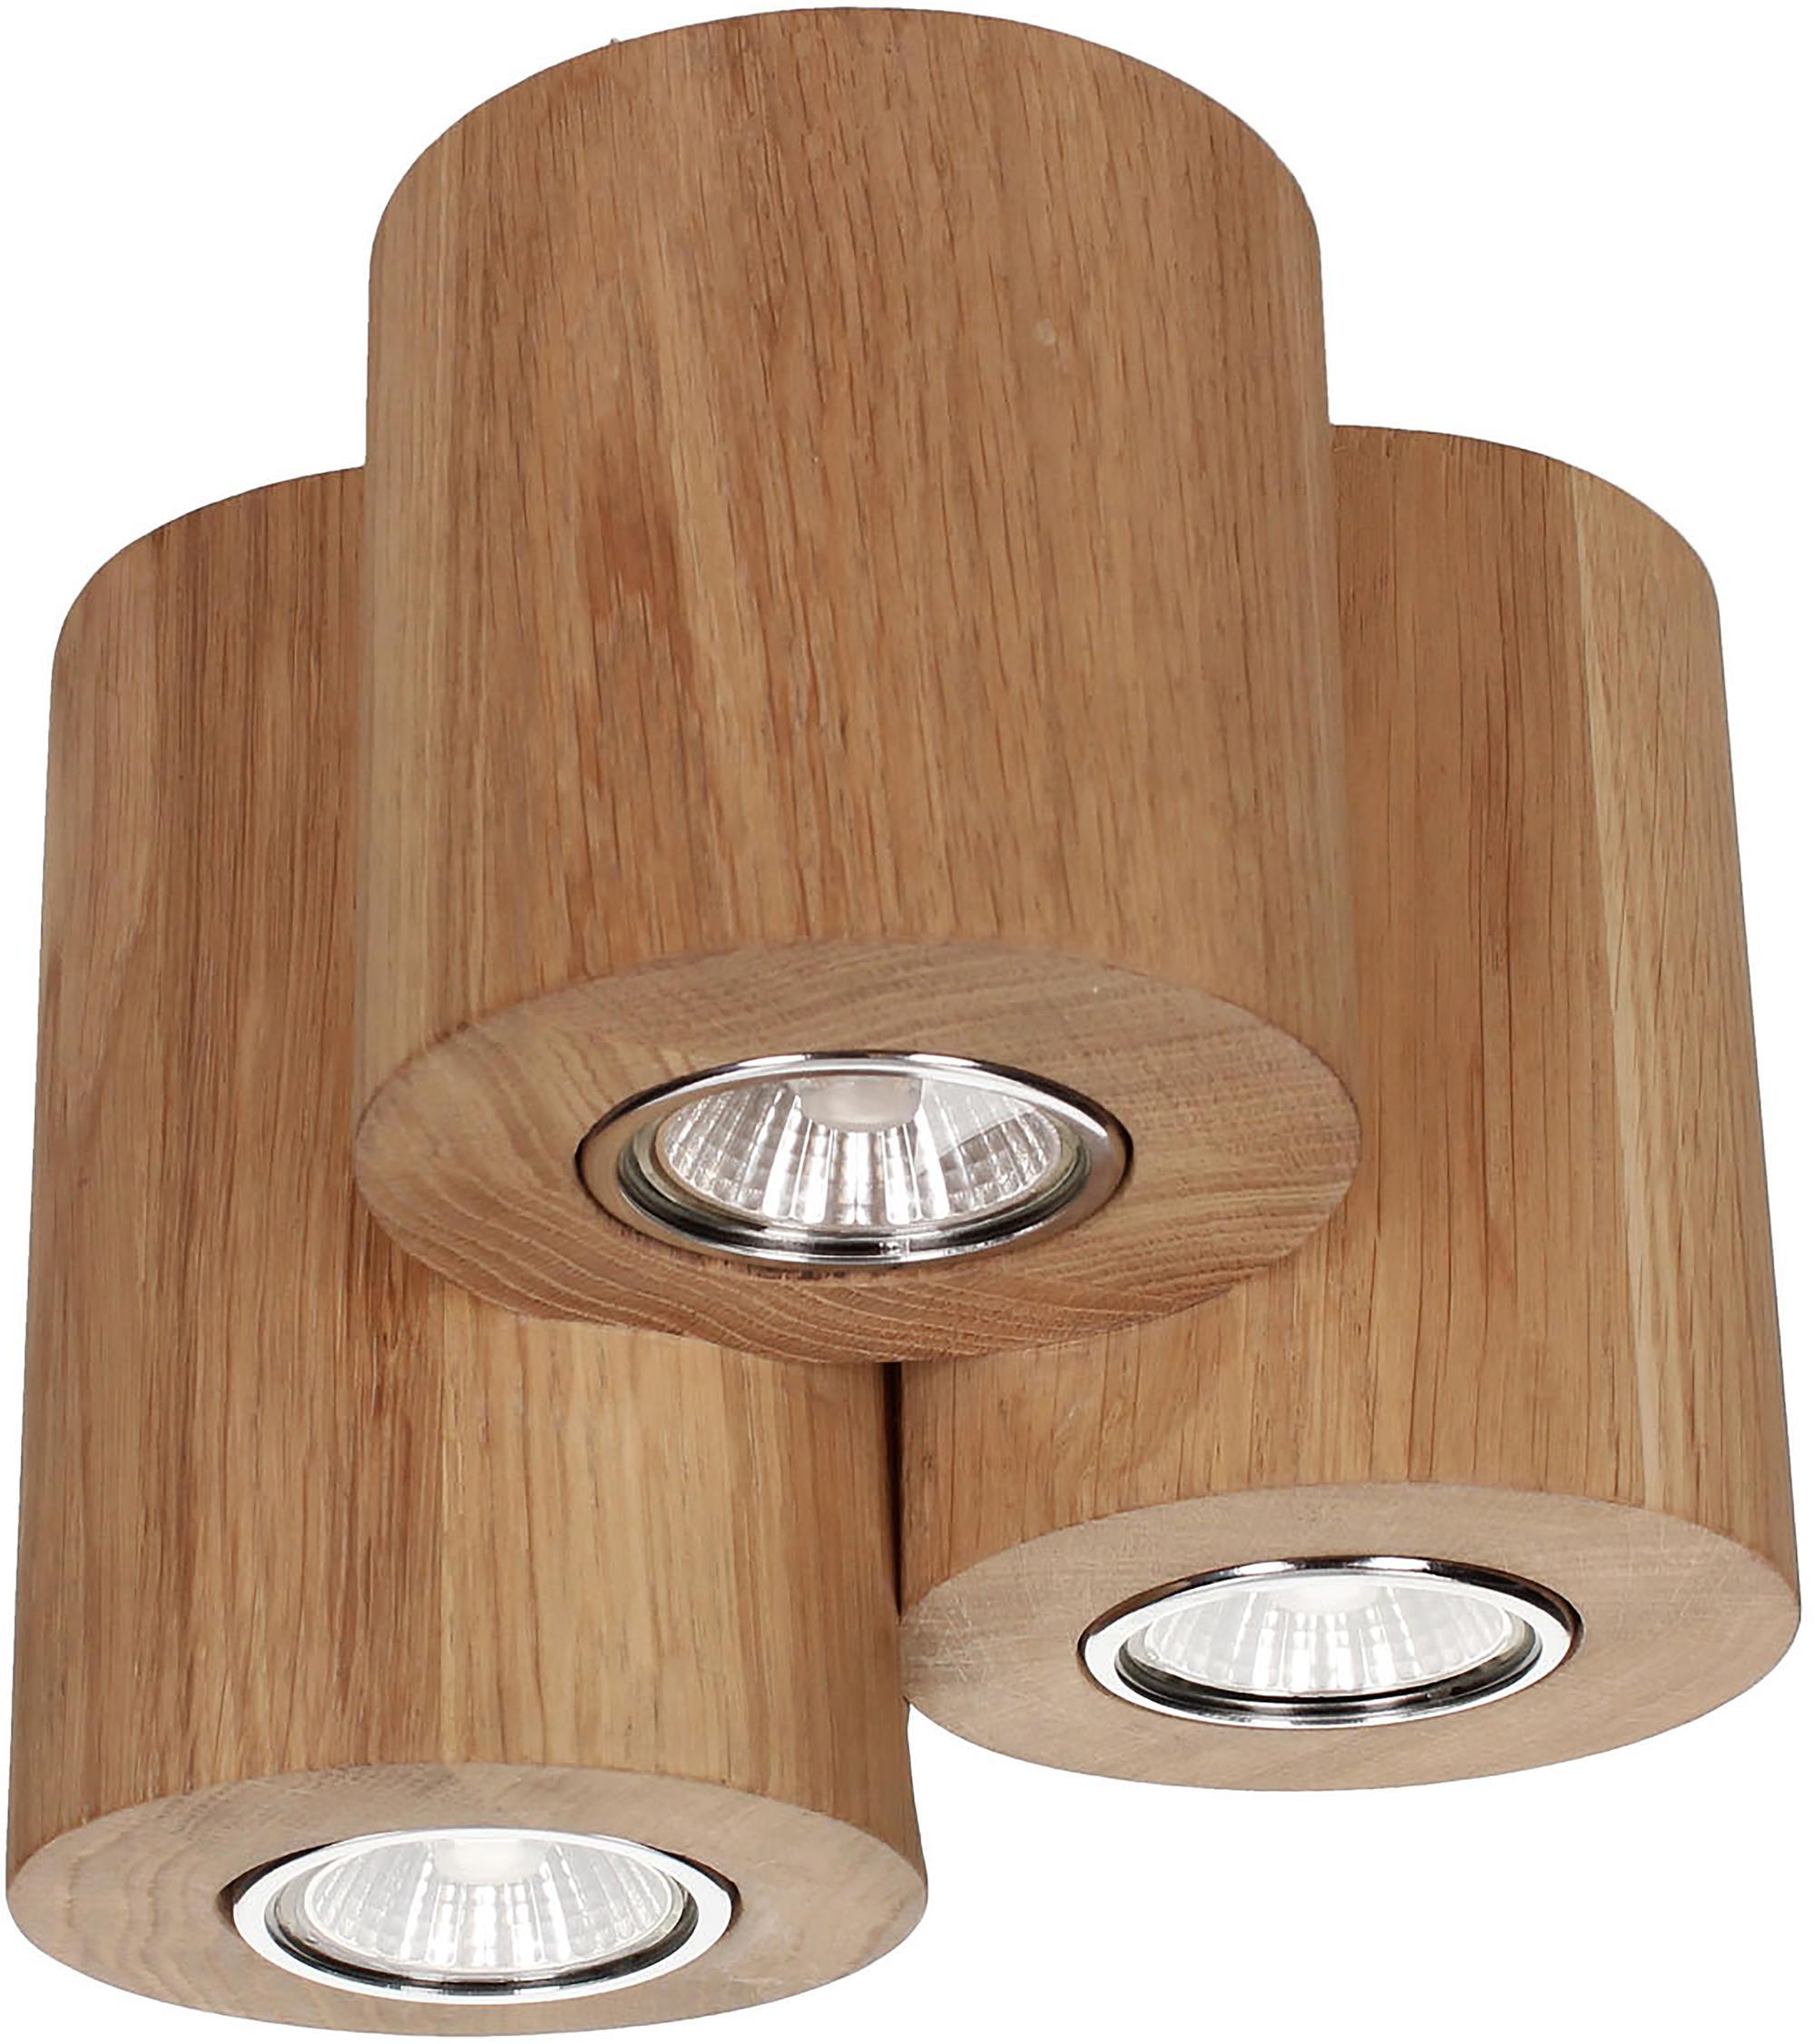 SPOT Light LED Deckenleuchte WOODDREAM, GU10, LED Deckenlampe